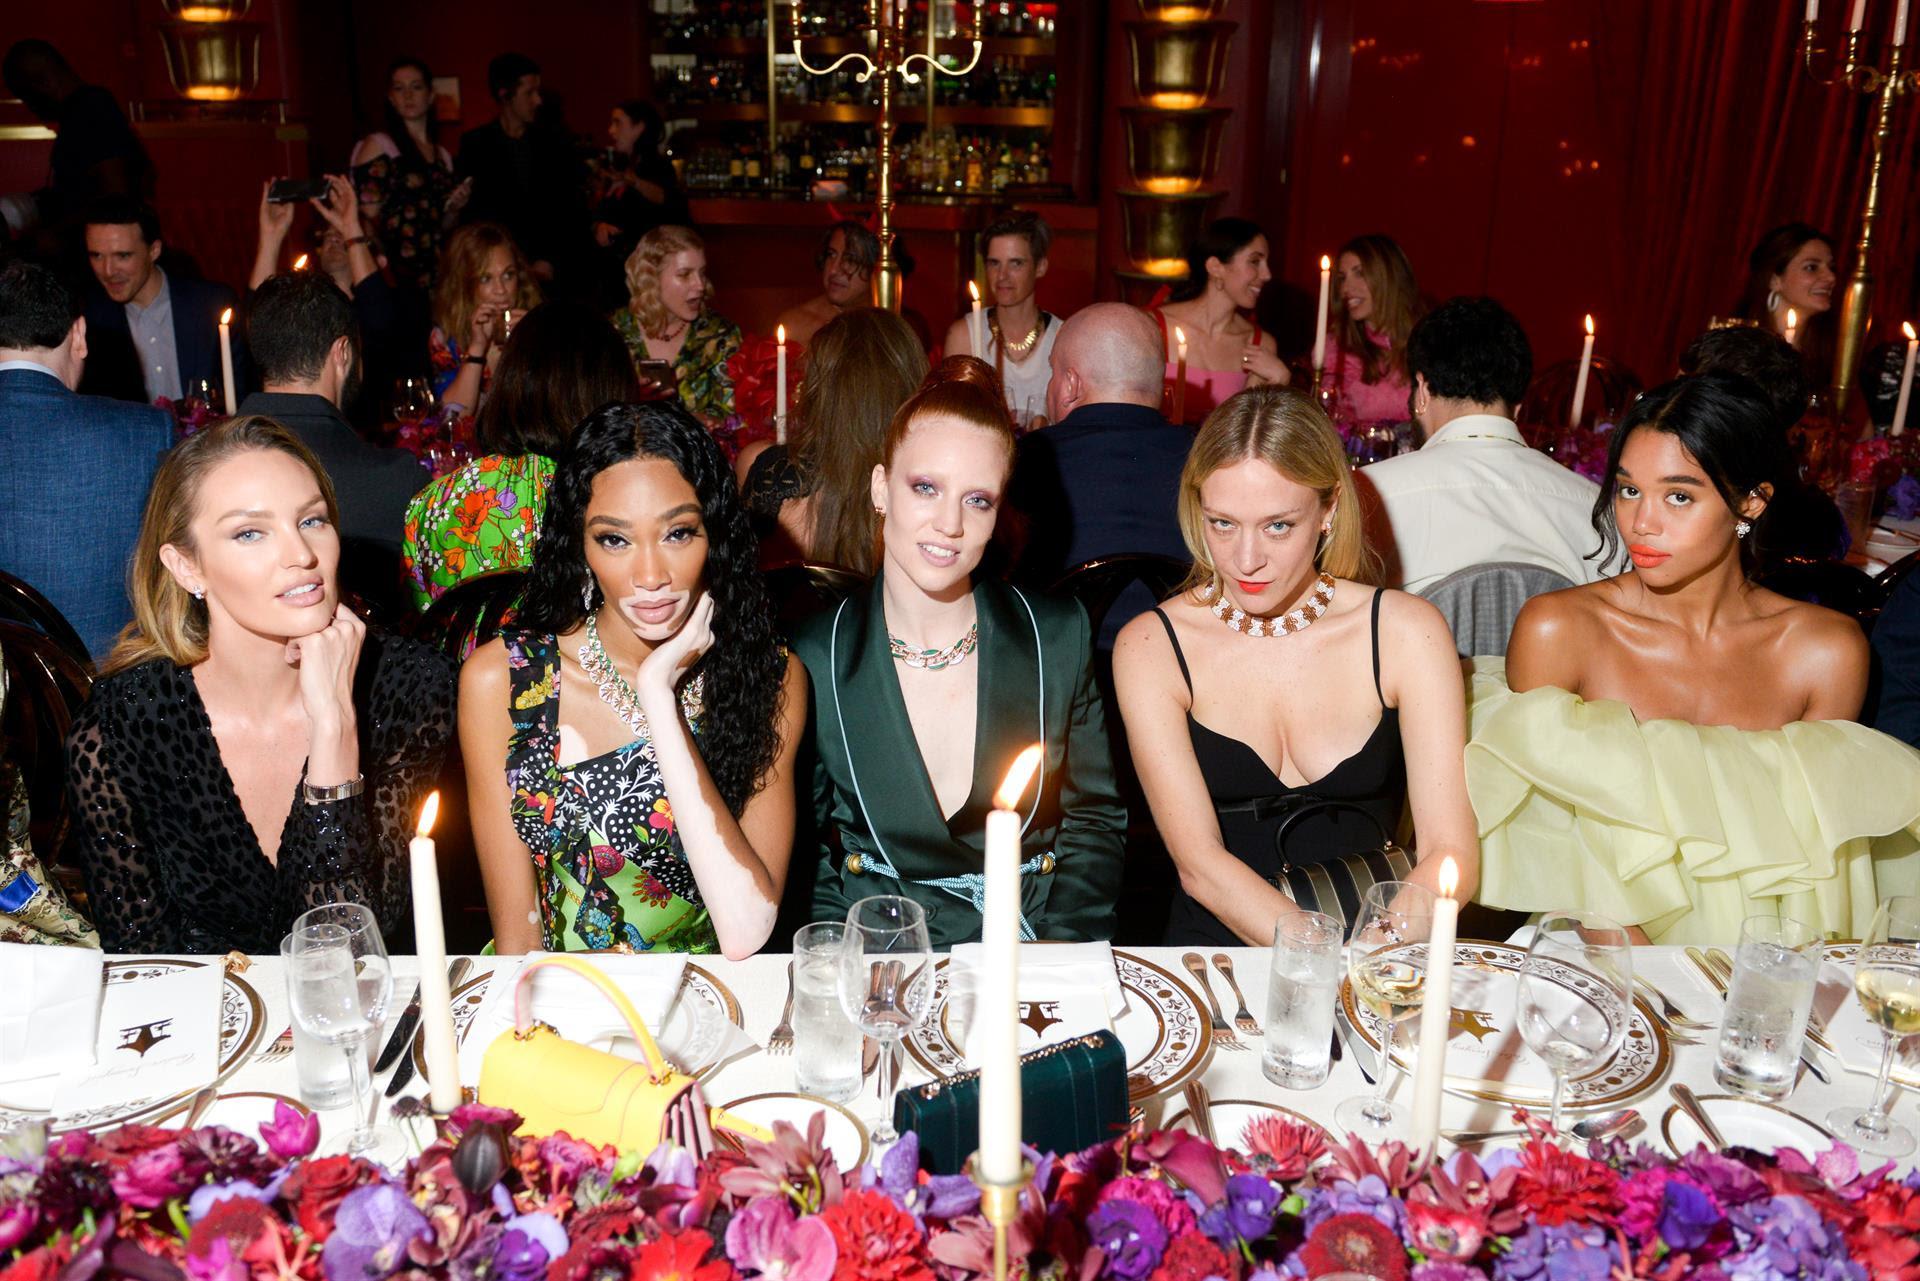 Candice Swanepoel, Winnie Harlow, Jess Glynne, Chloë Sevigny, and Laura Harrier